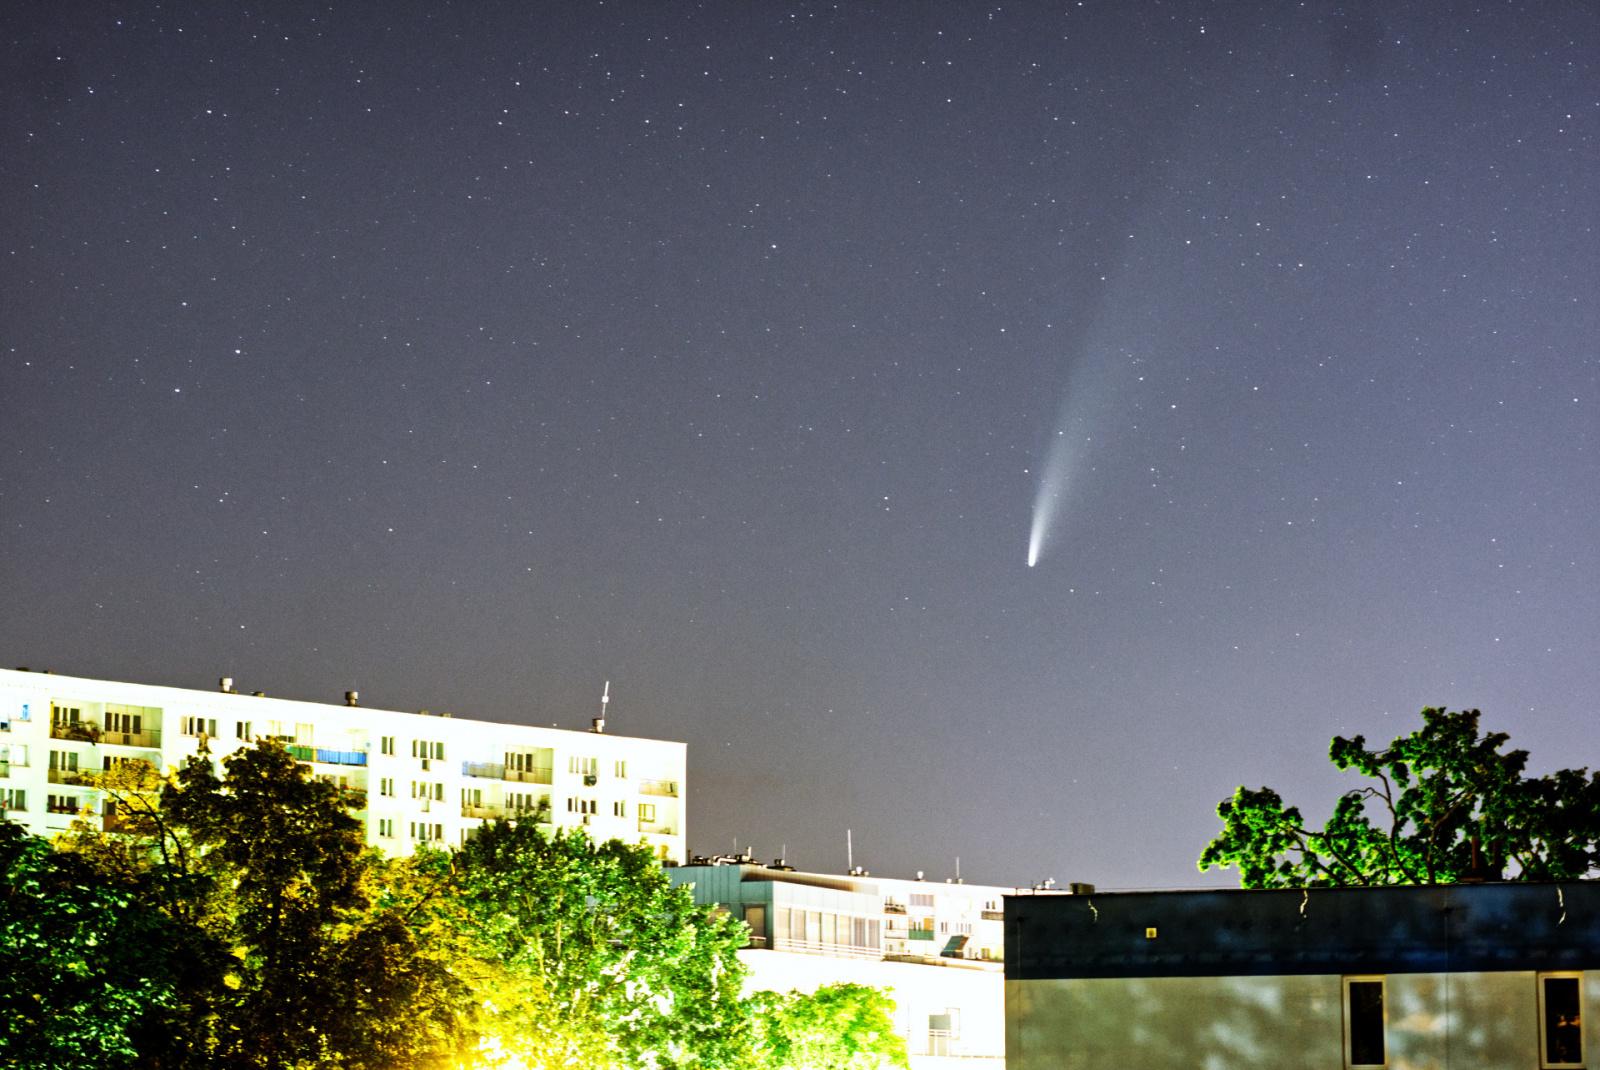 LC_NEOWISE1.thumb.jpg.042f28698c2e93f4ee67907b84e4c146.jpg